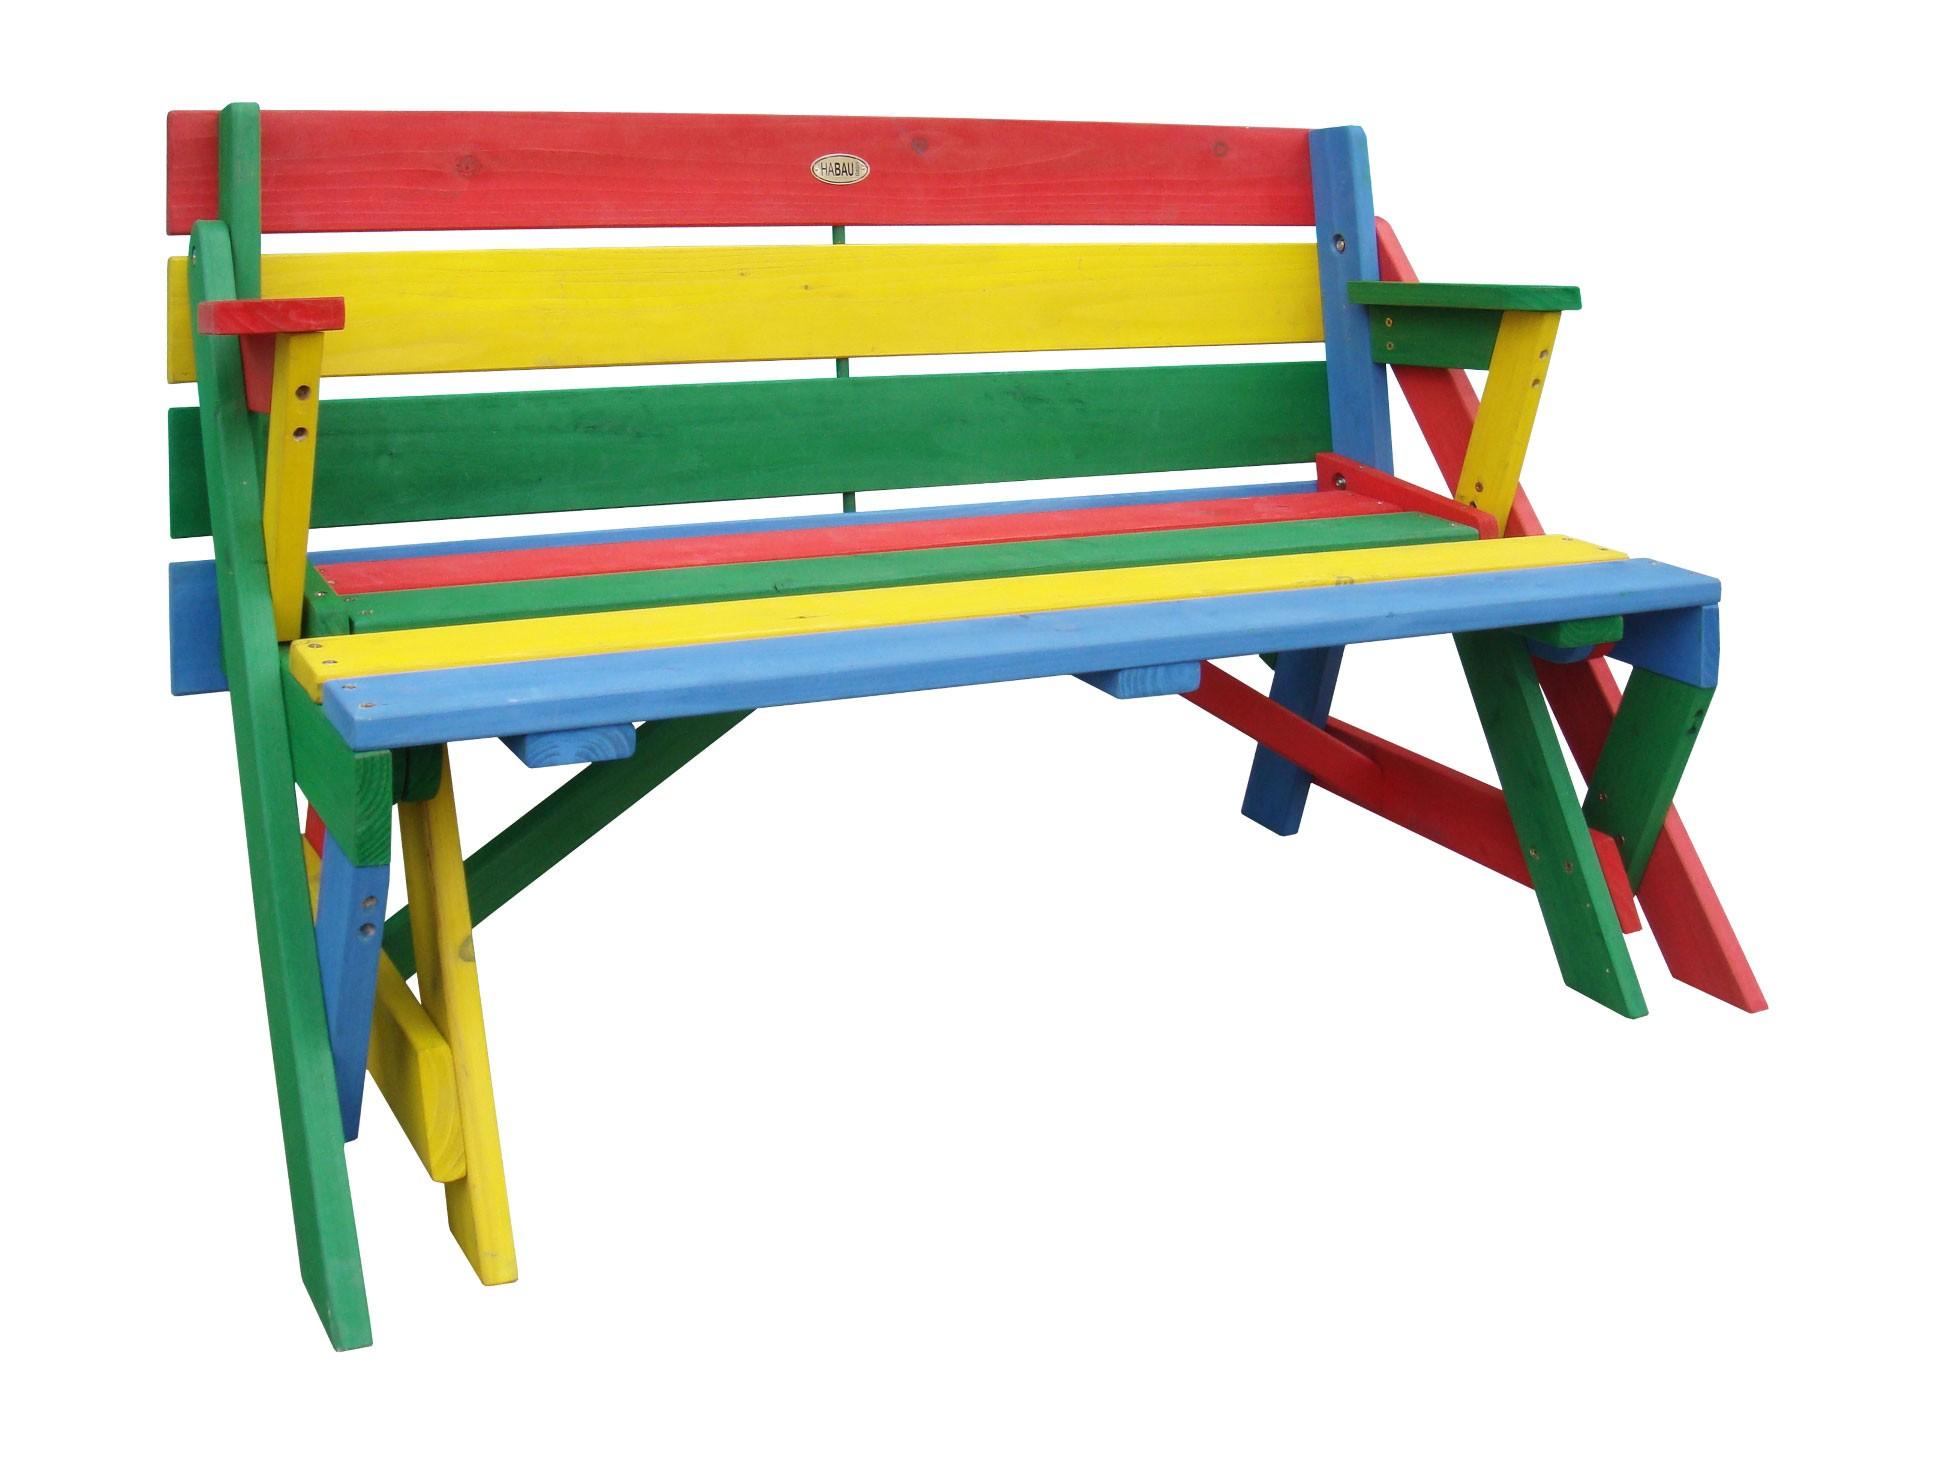 kinder picknicktisch sitzbank habau farbig klappbar 2 funktionen bei. Black Bedroom Furniture Sets. Home Design Ideas